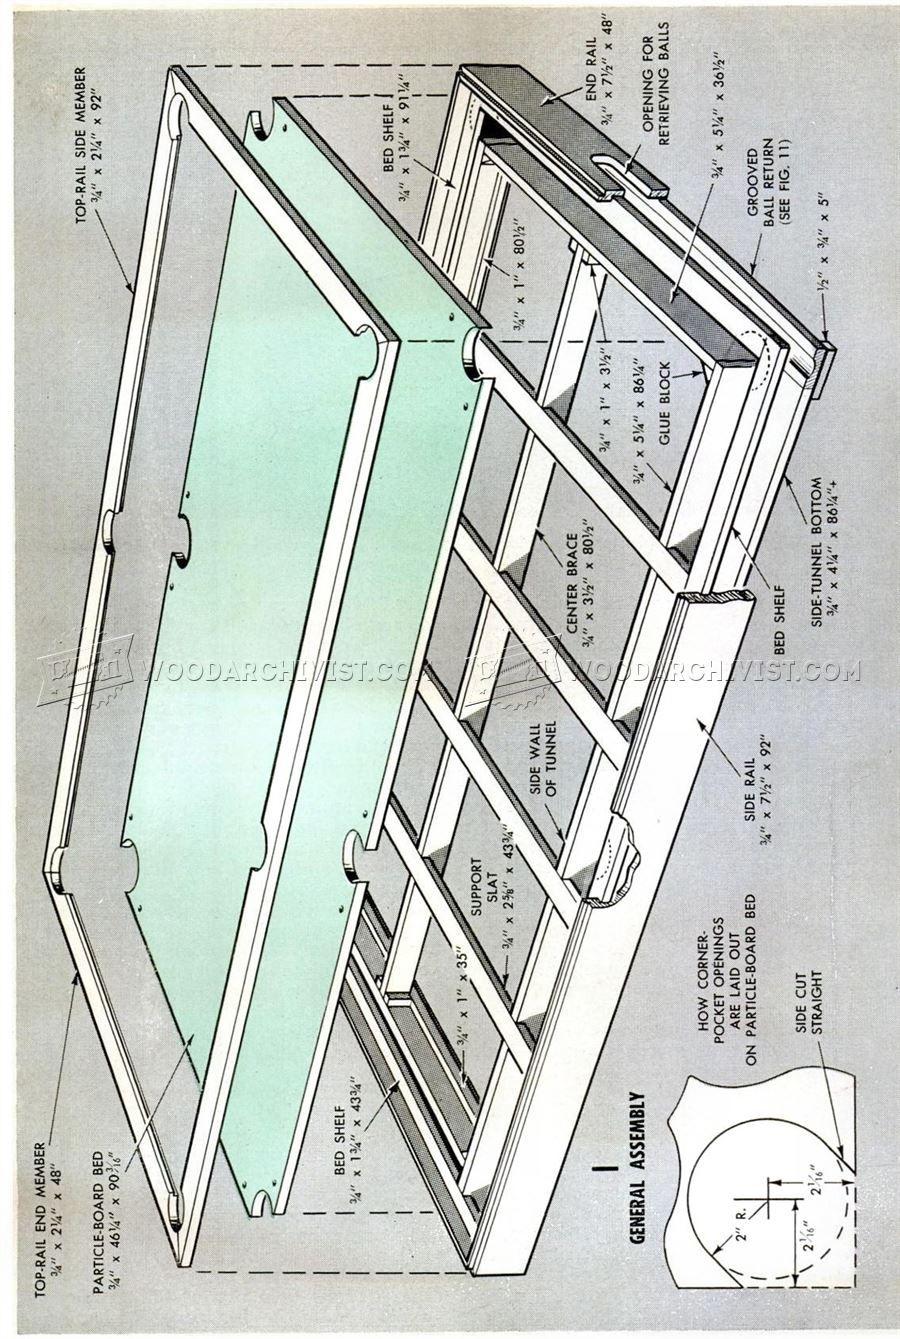 DIY Pool Table Woodworking Plans Electron Pinterest Diy - Pool table blueprints